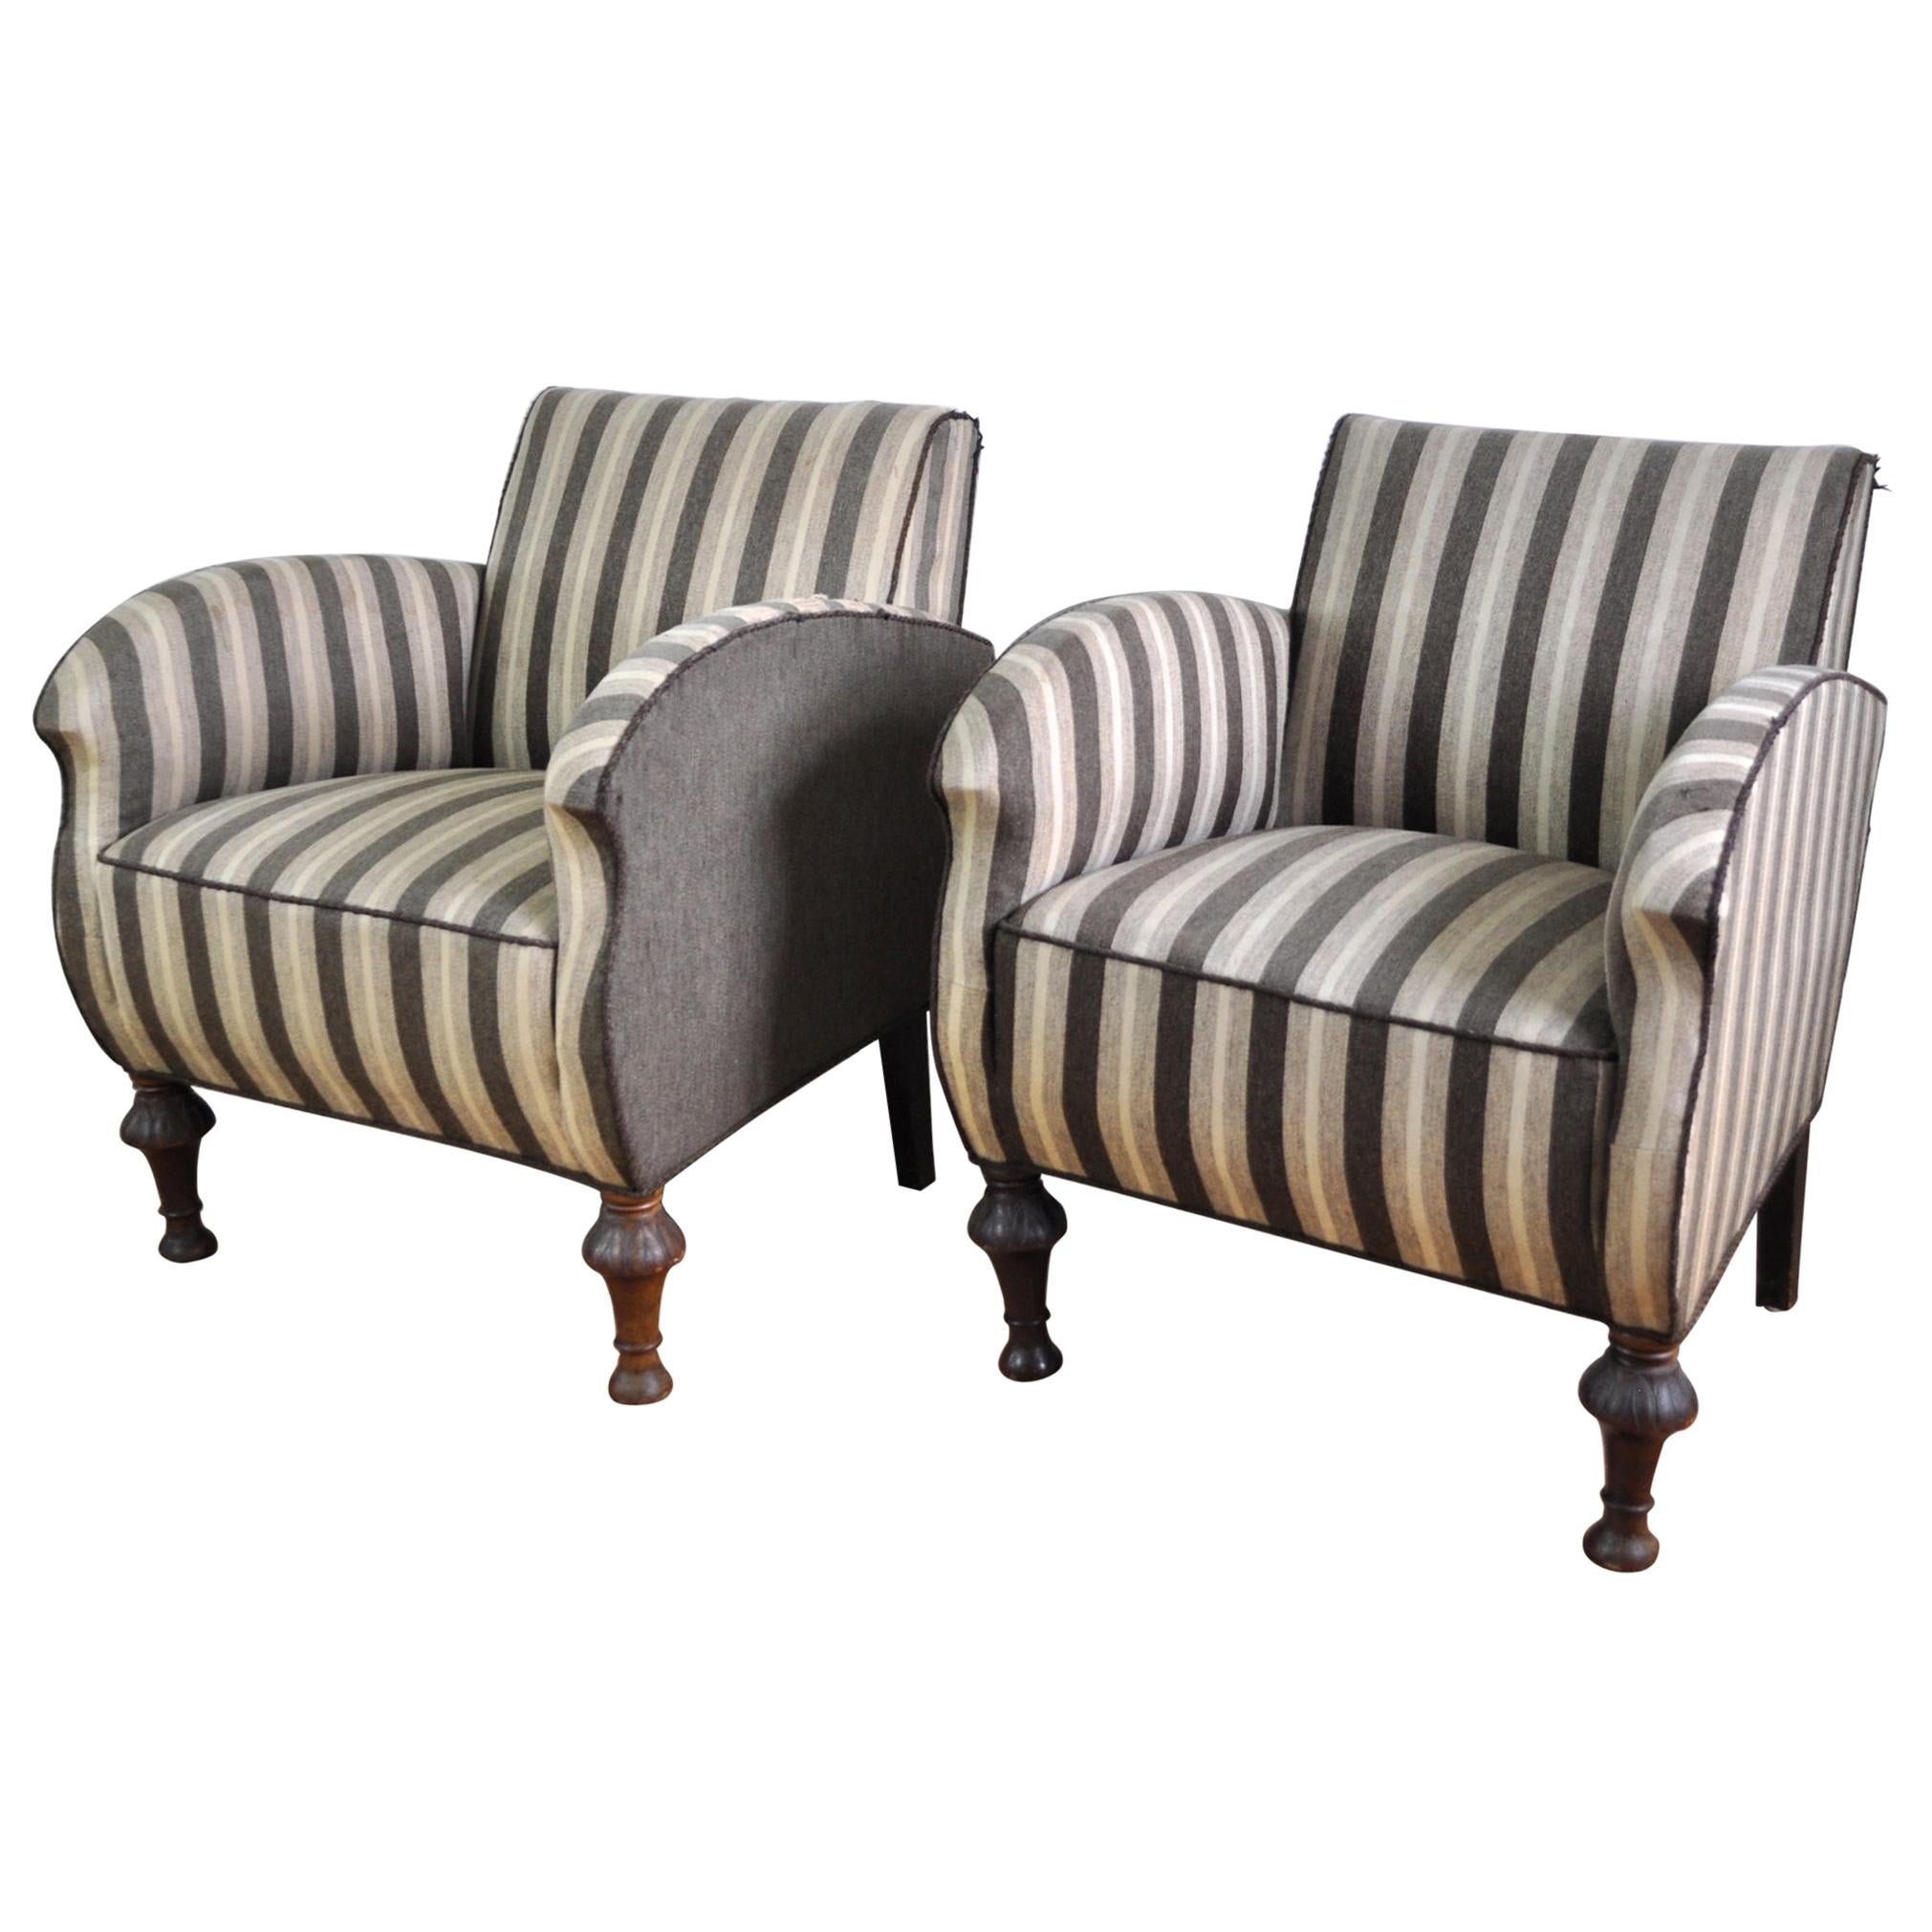 Danish Art Deco Club or Lounge Chairs, 1920s-1940s